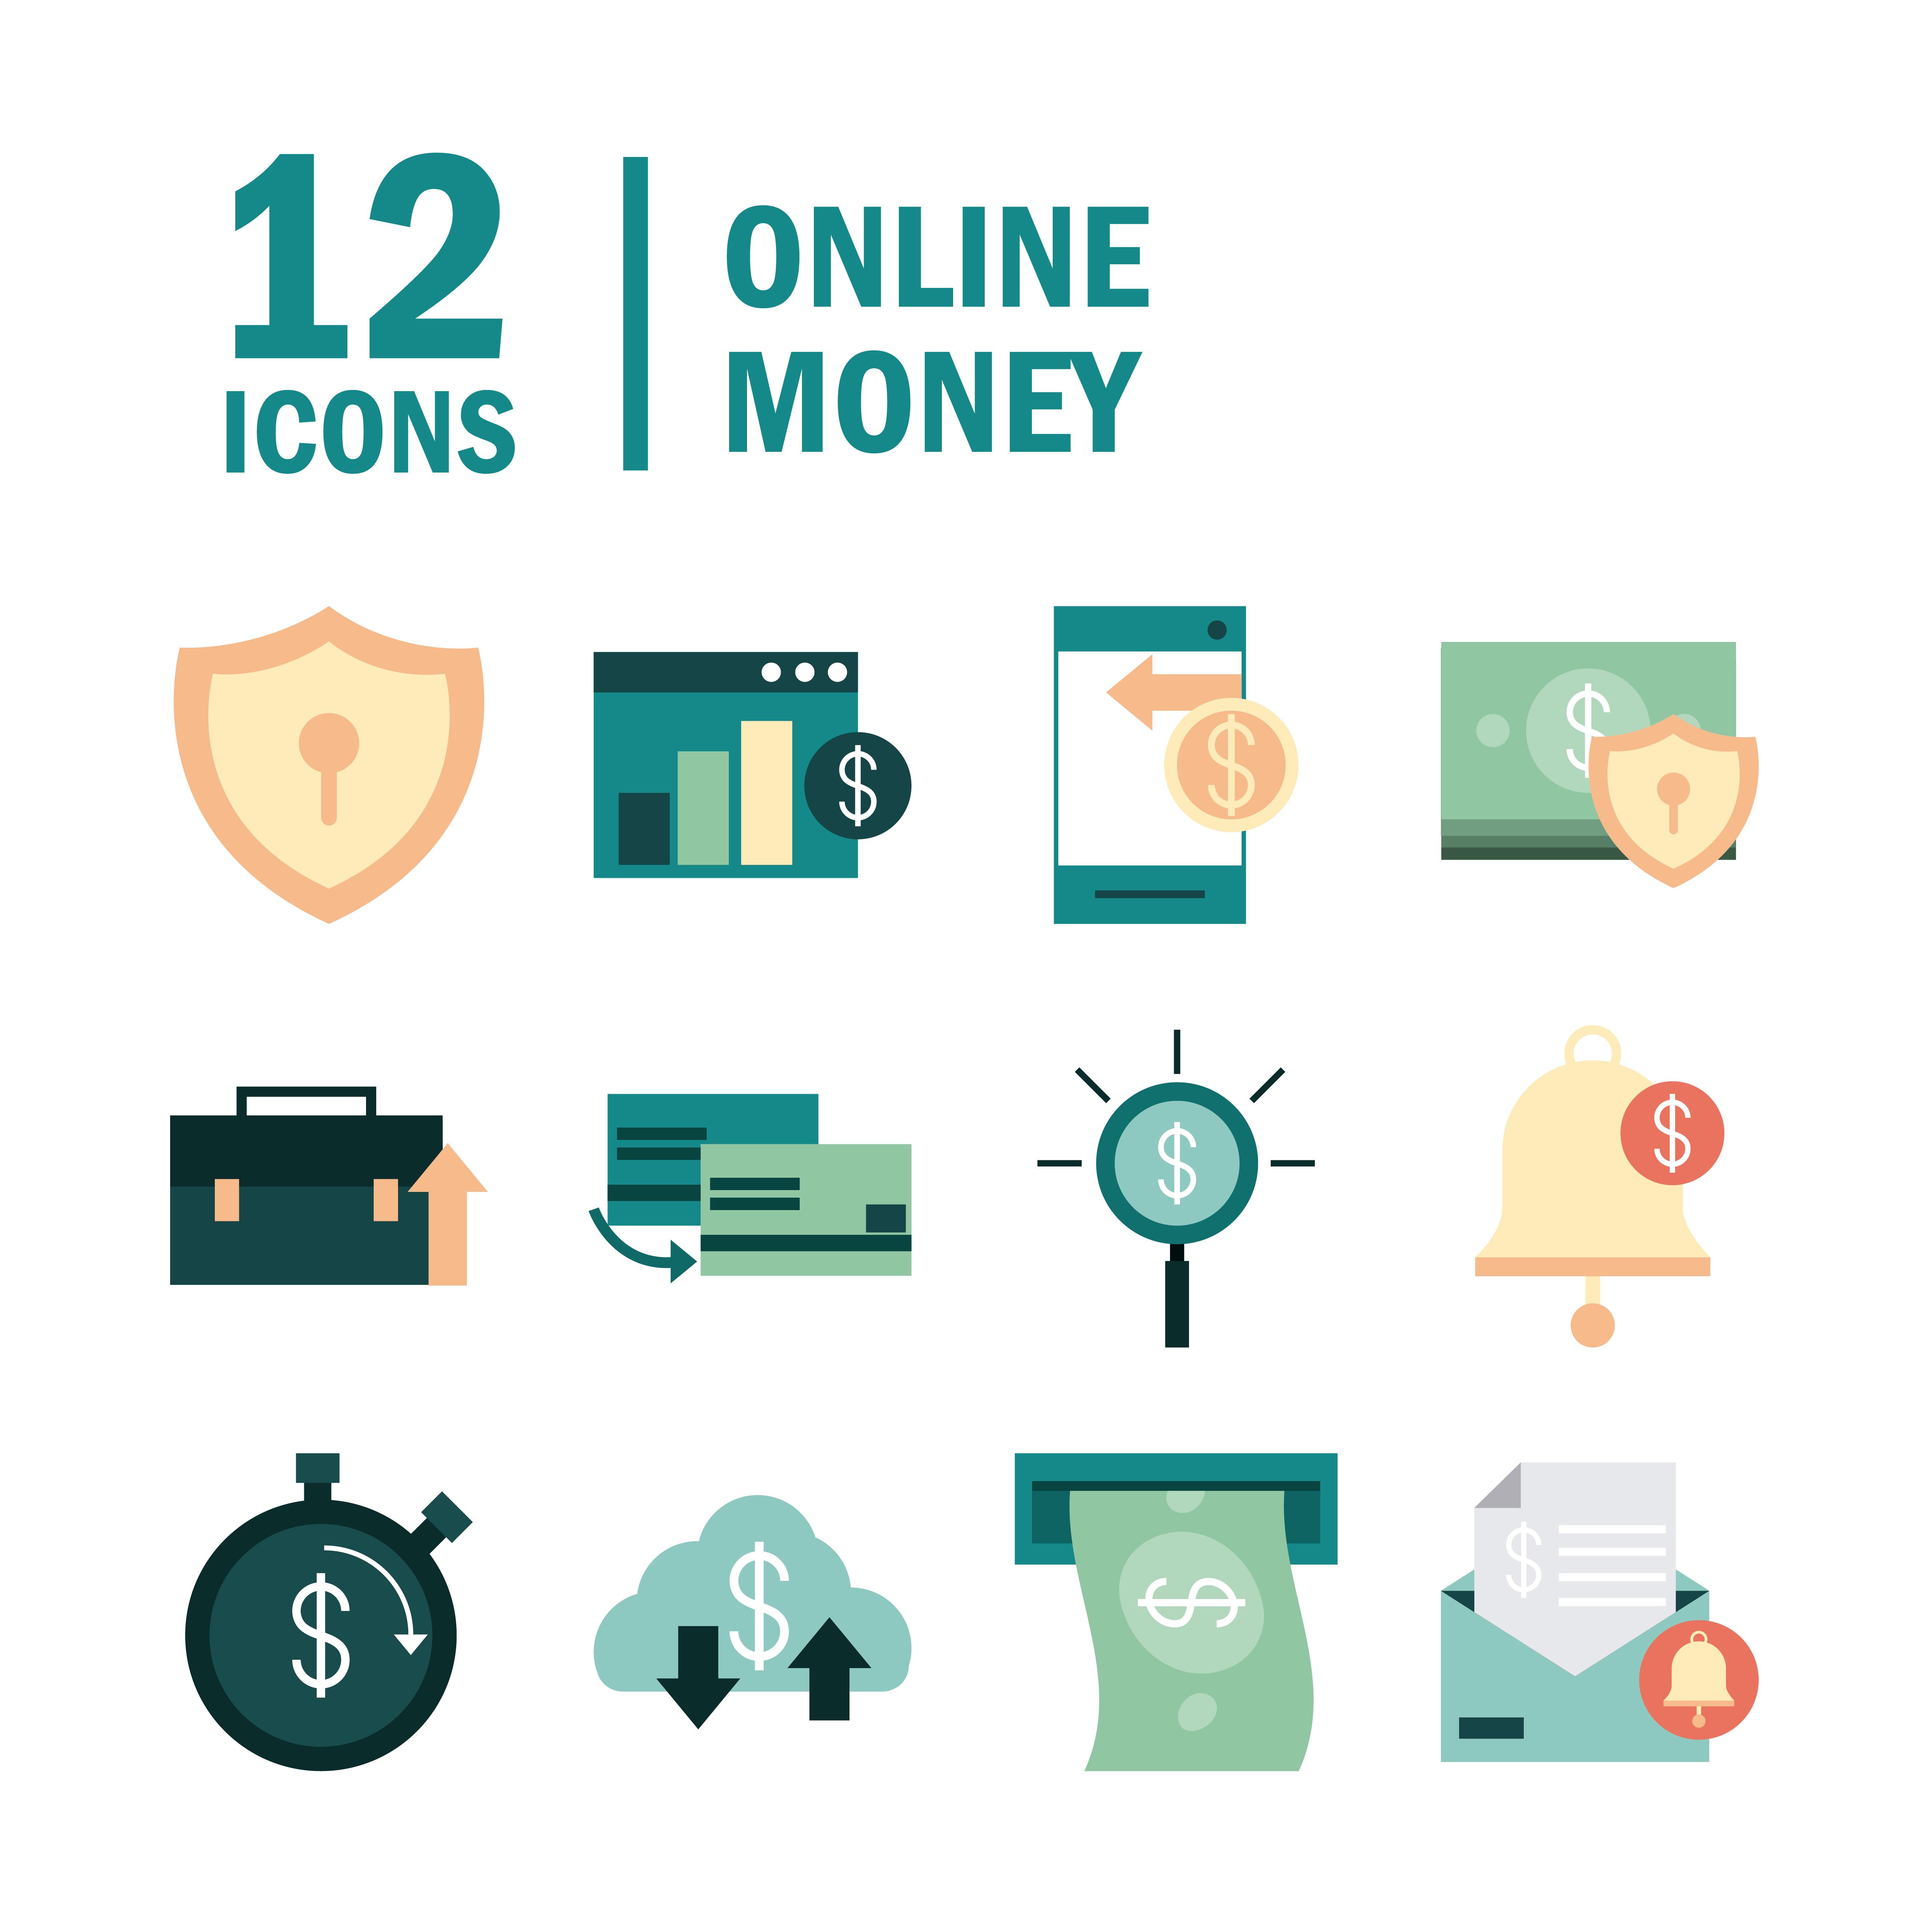 E-bank and online finances icon set